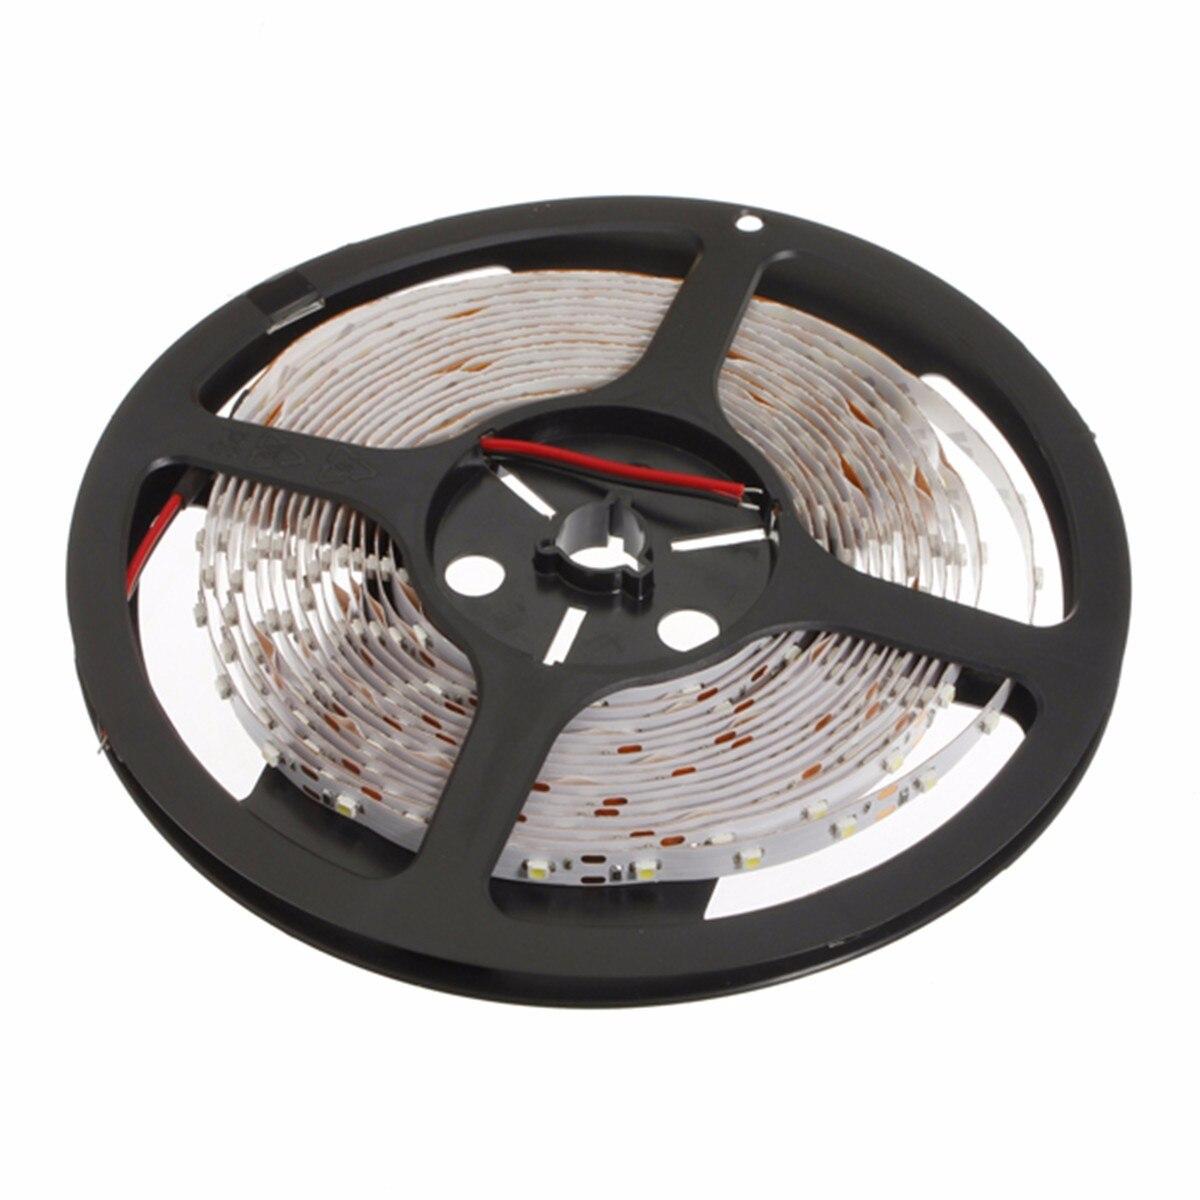 Mising 5M LED Strip 3528 Fiexible Light 60Led/m 300Led DC 12V Cool White LED Ribbon Lights Christmas Non-Waterproof